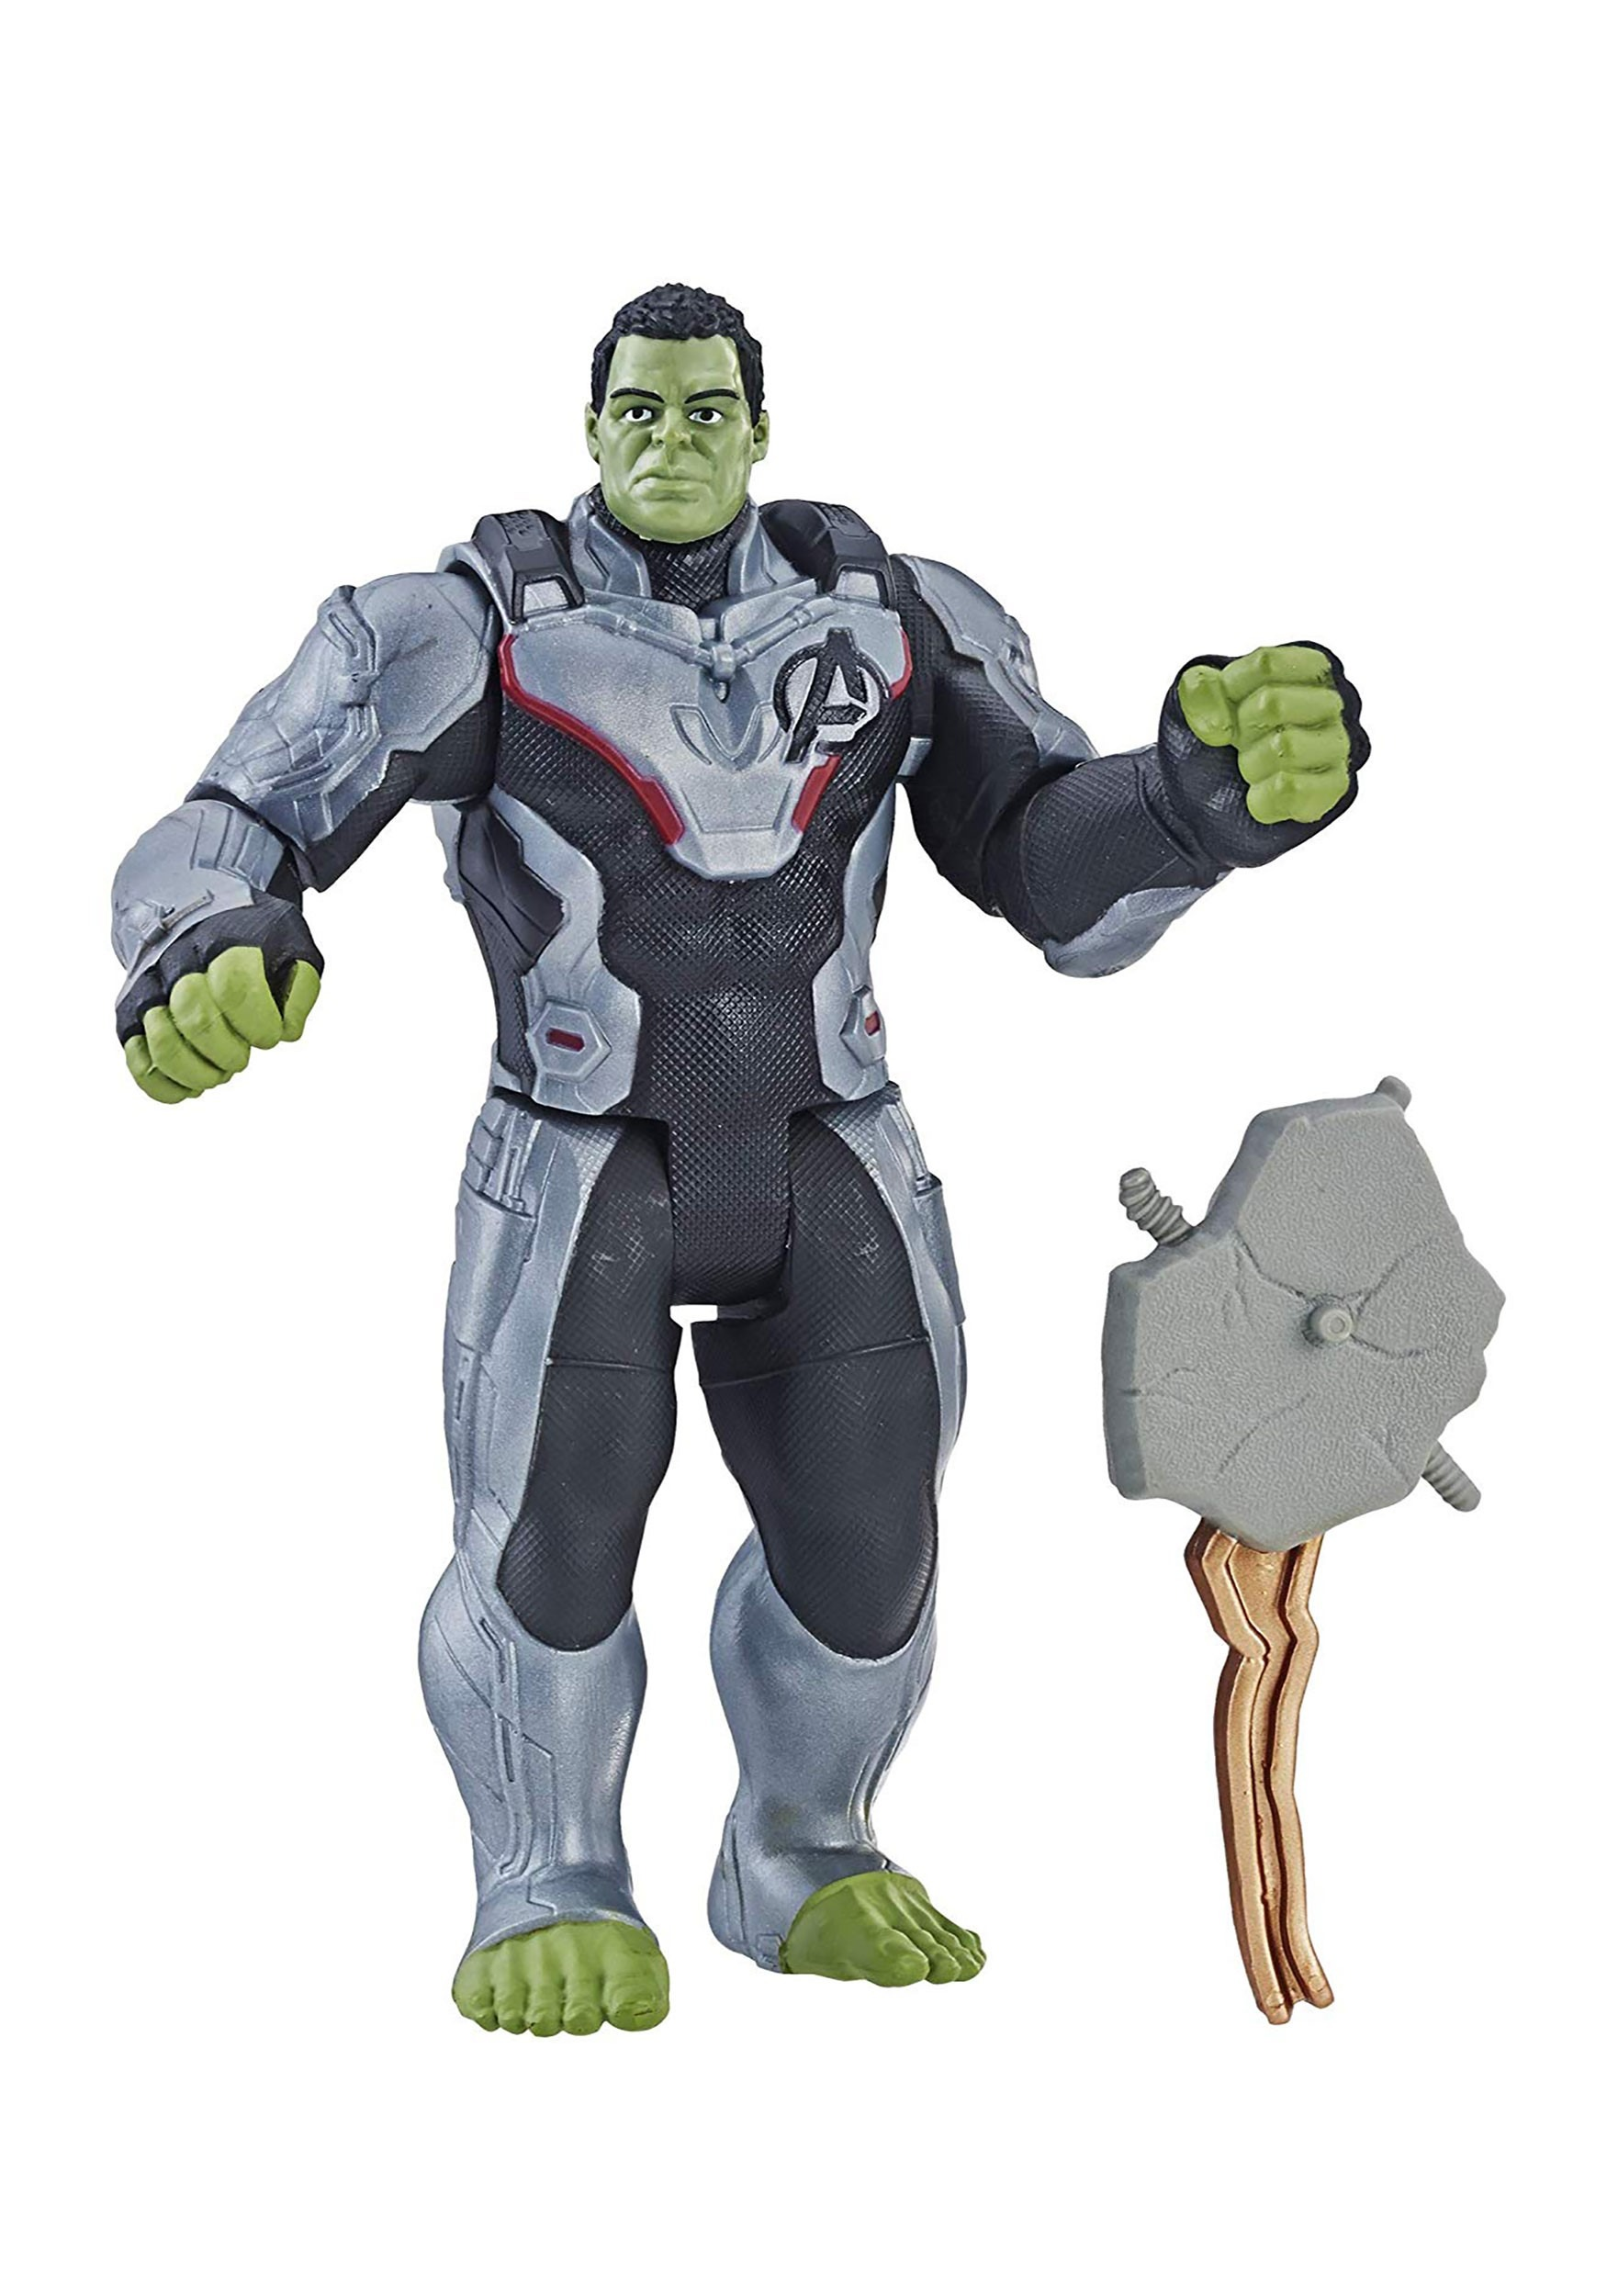 Hulk Team Suit - Avengers: Endgame Deluxe Action Figure